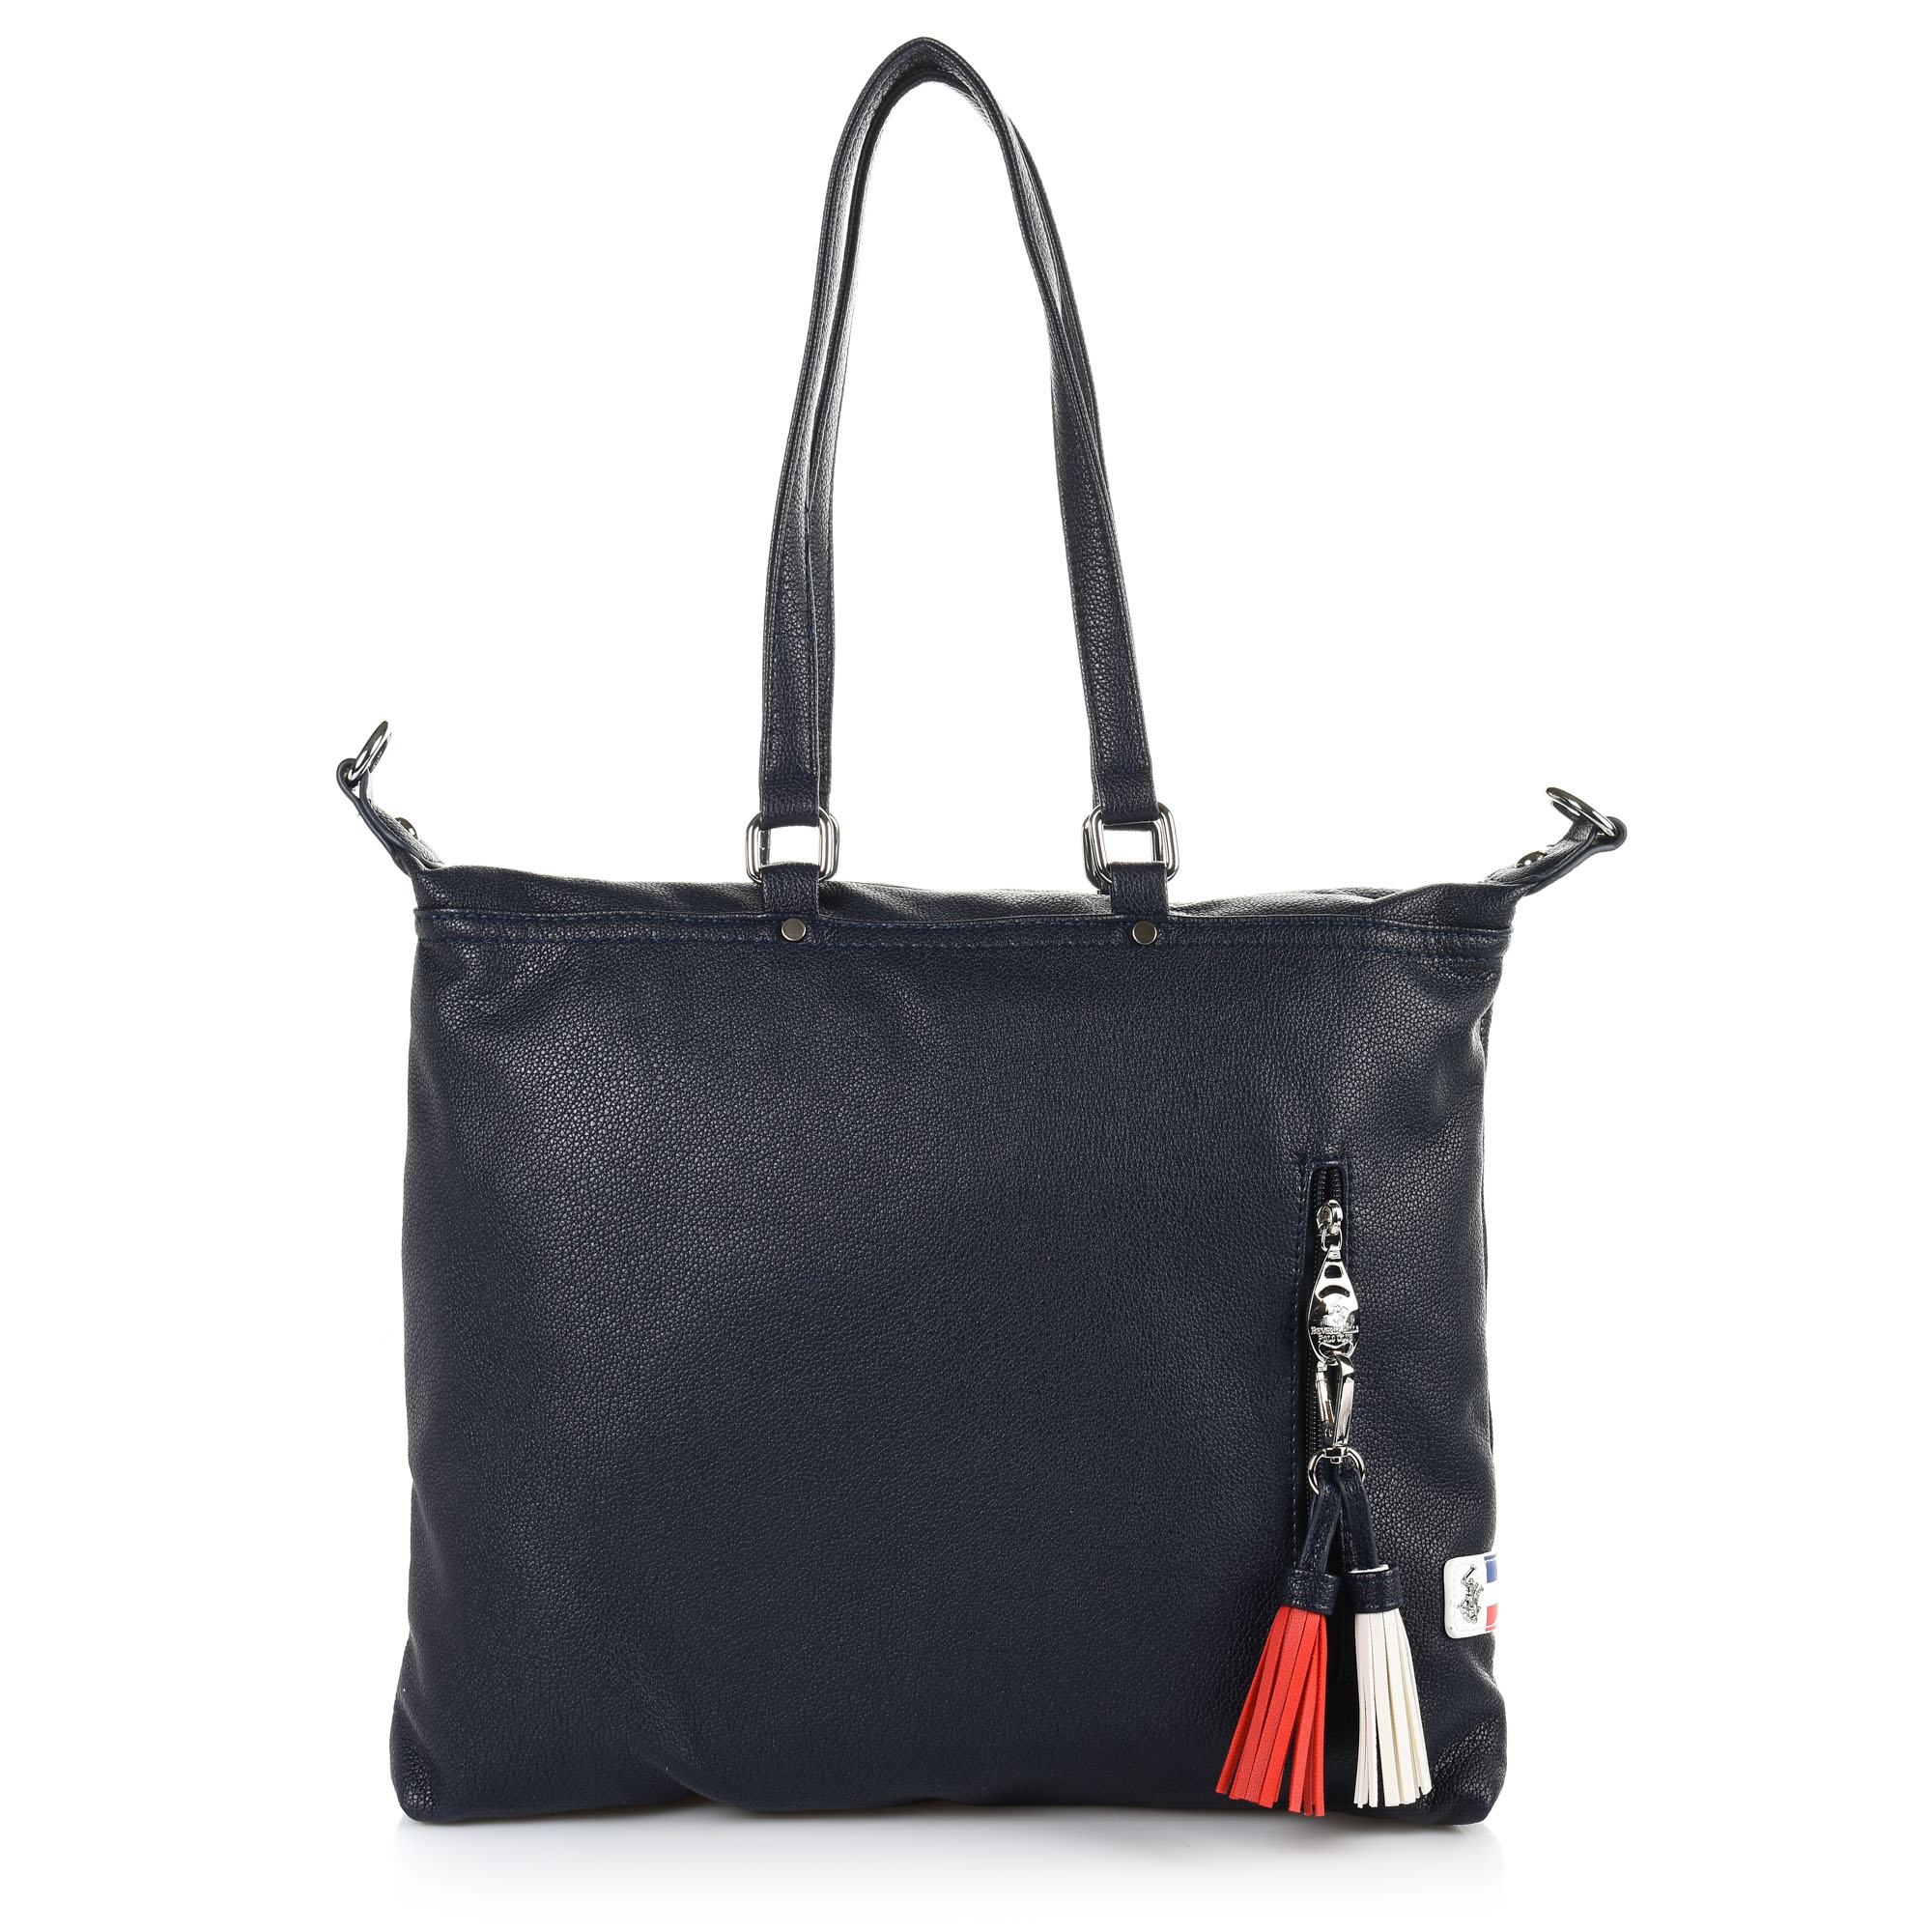 97fdd74456 Brand Bags Τσάντα Ώμου Beverly Hills Polo Club ΒΗ-1722